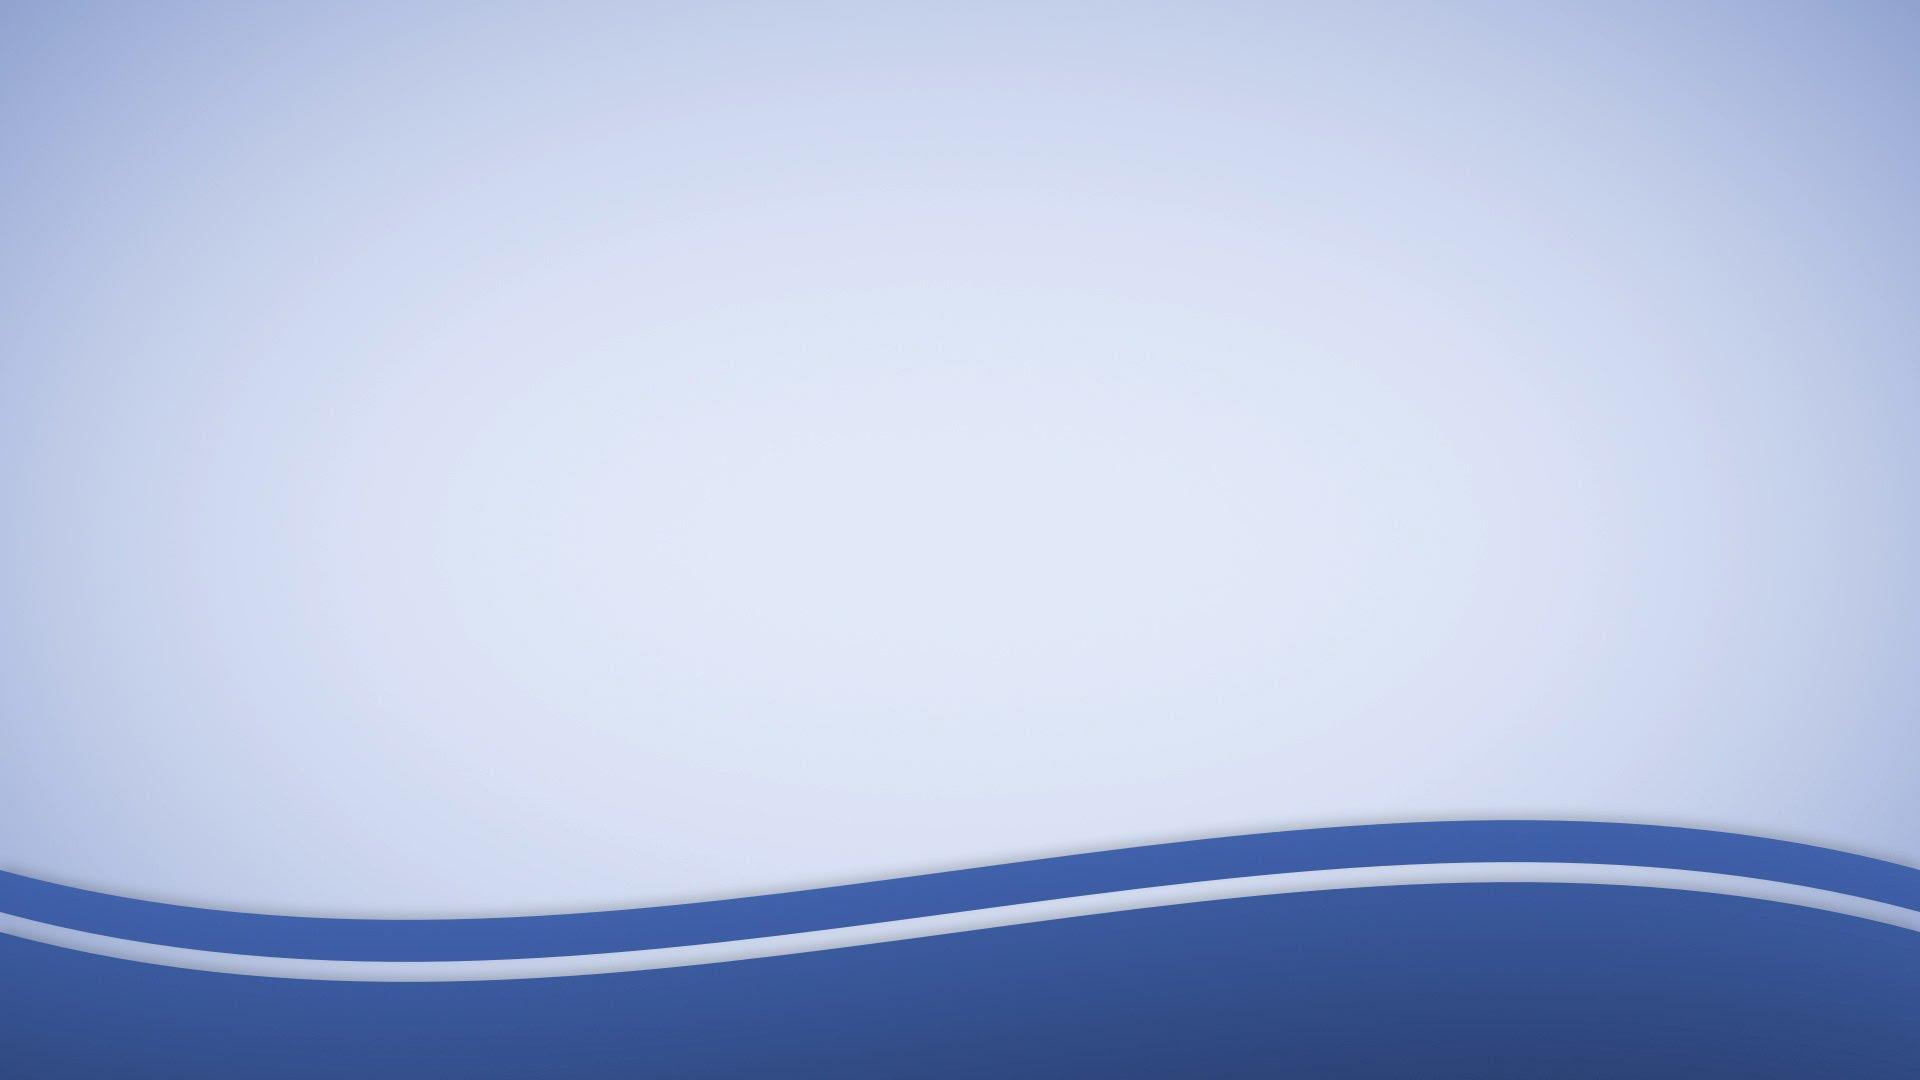 hinh nen powerpoint mau xanh 28